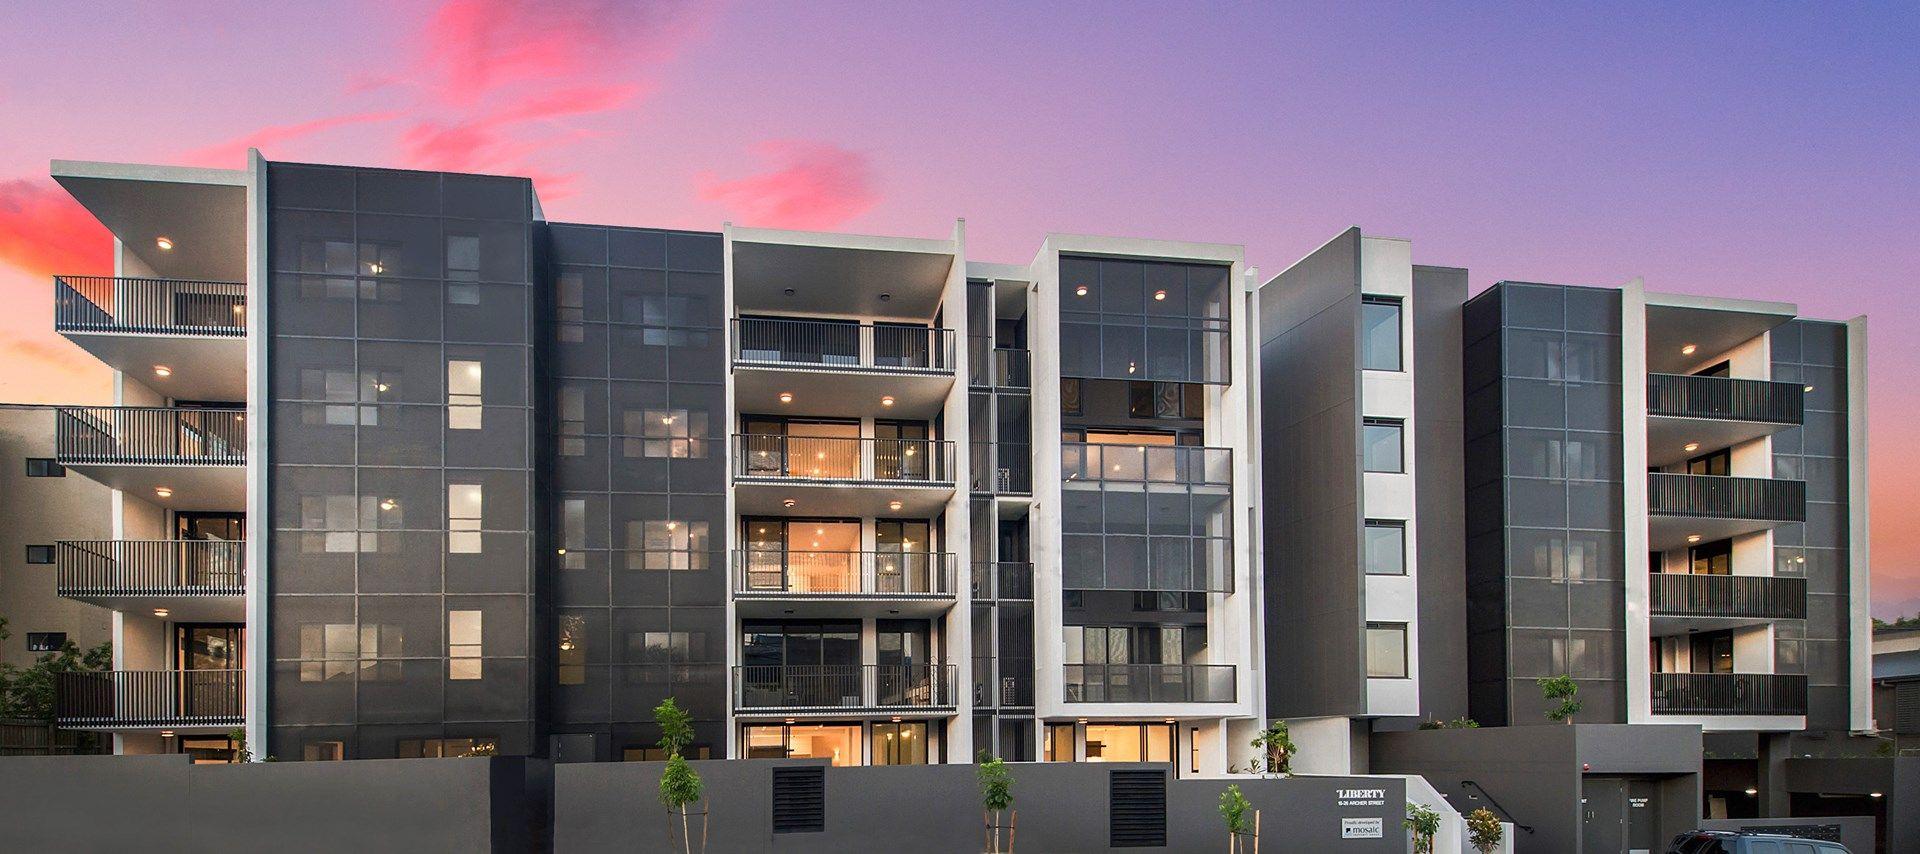 404/16-26 Archer Street, Upper Mount Gravatt QLD 4122, Image 1